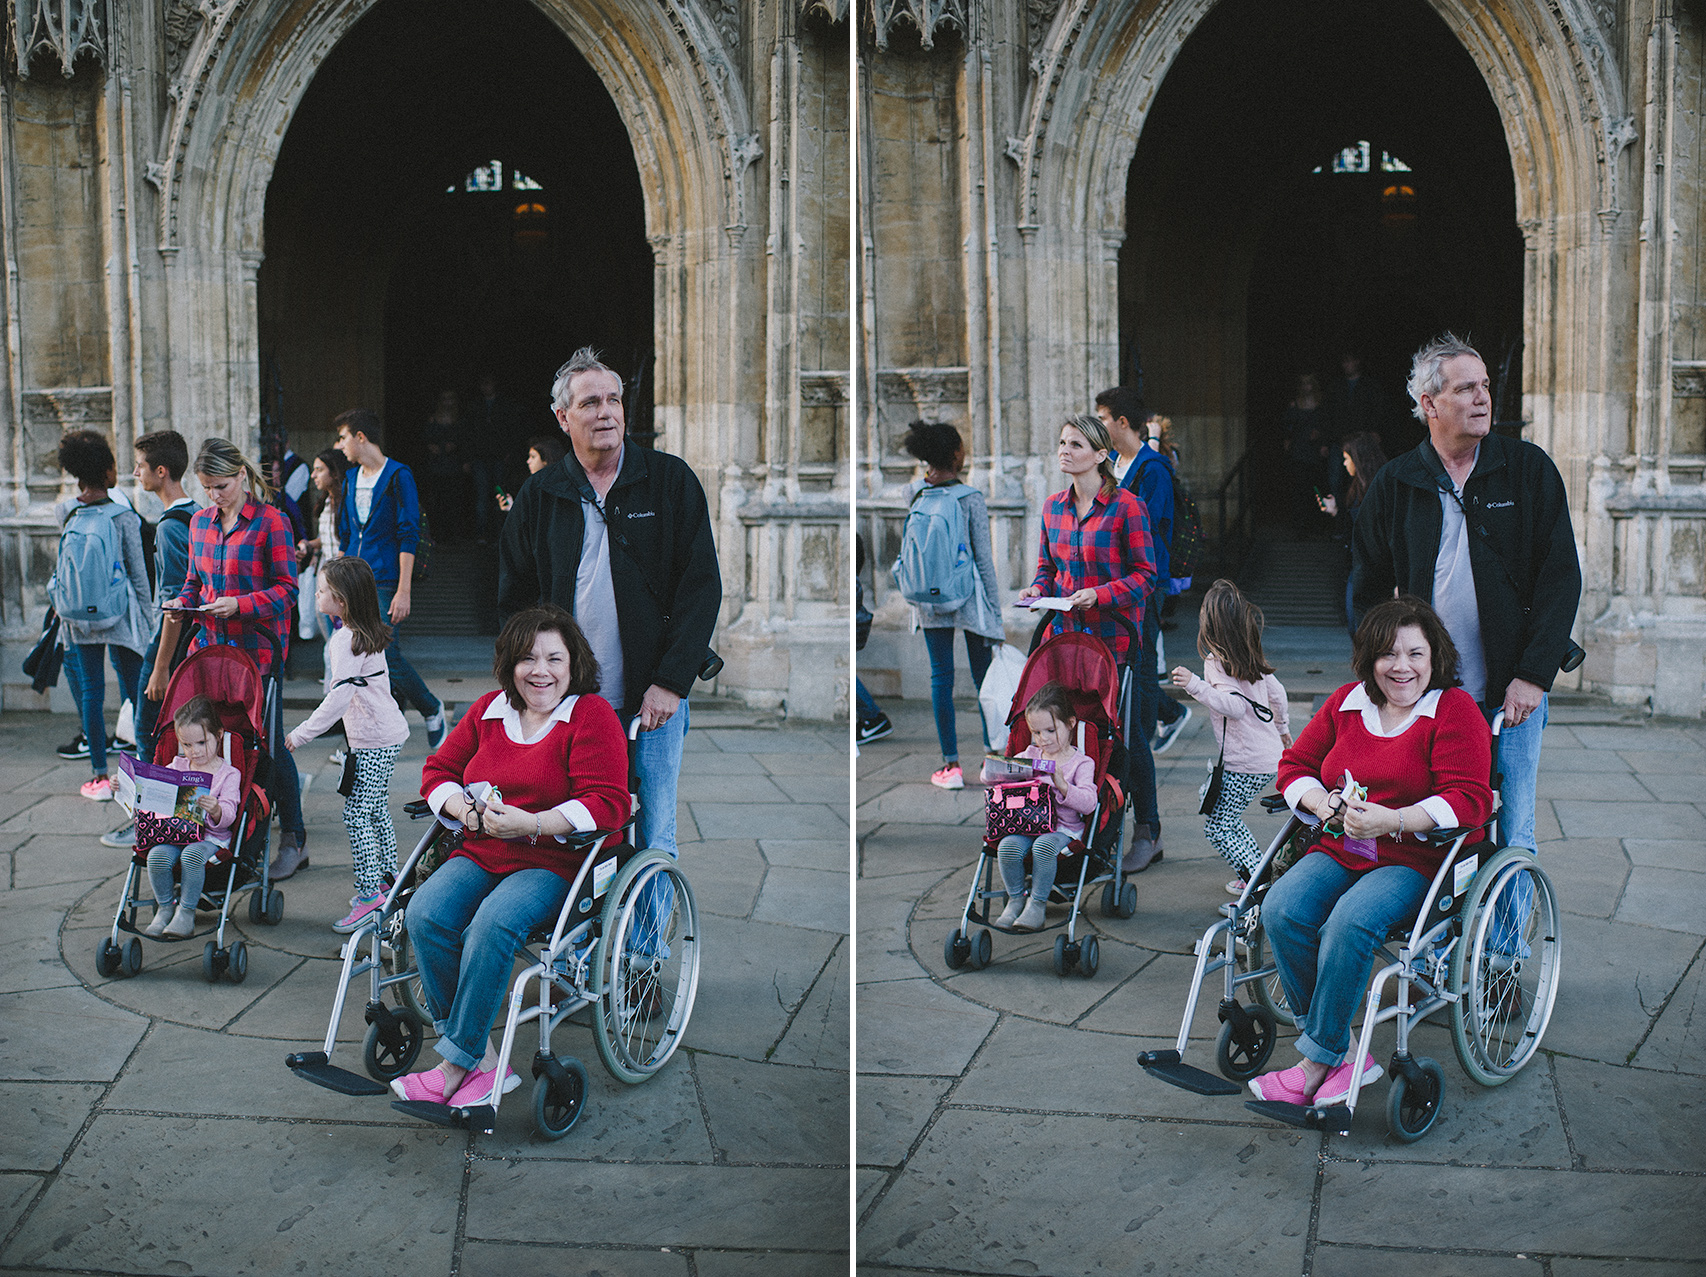 20151012_CAMBRIDGE_003.jpg